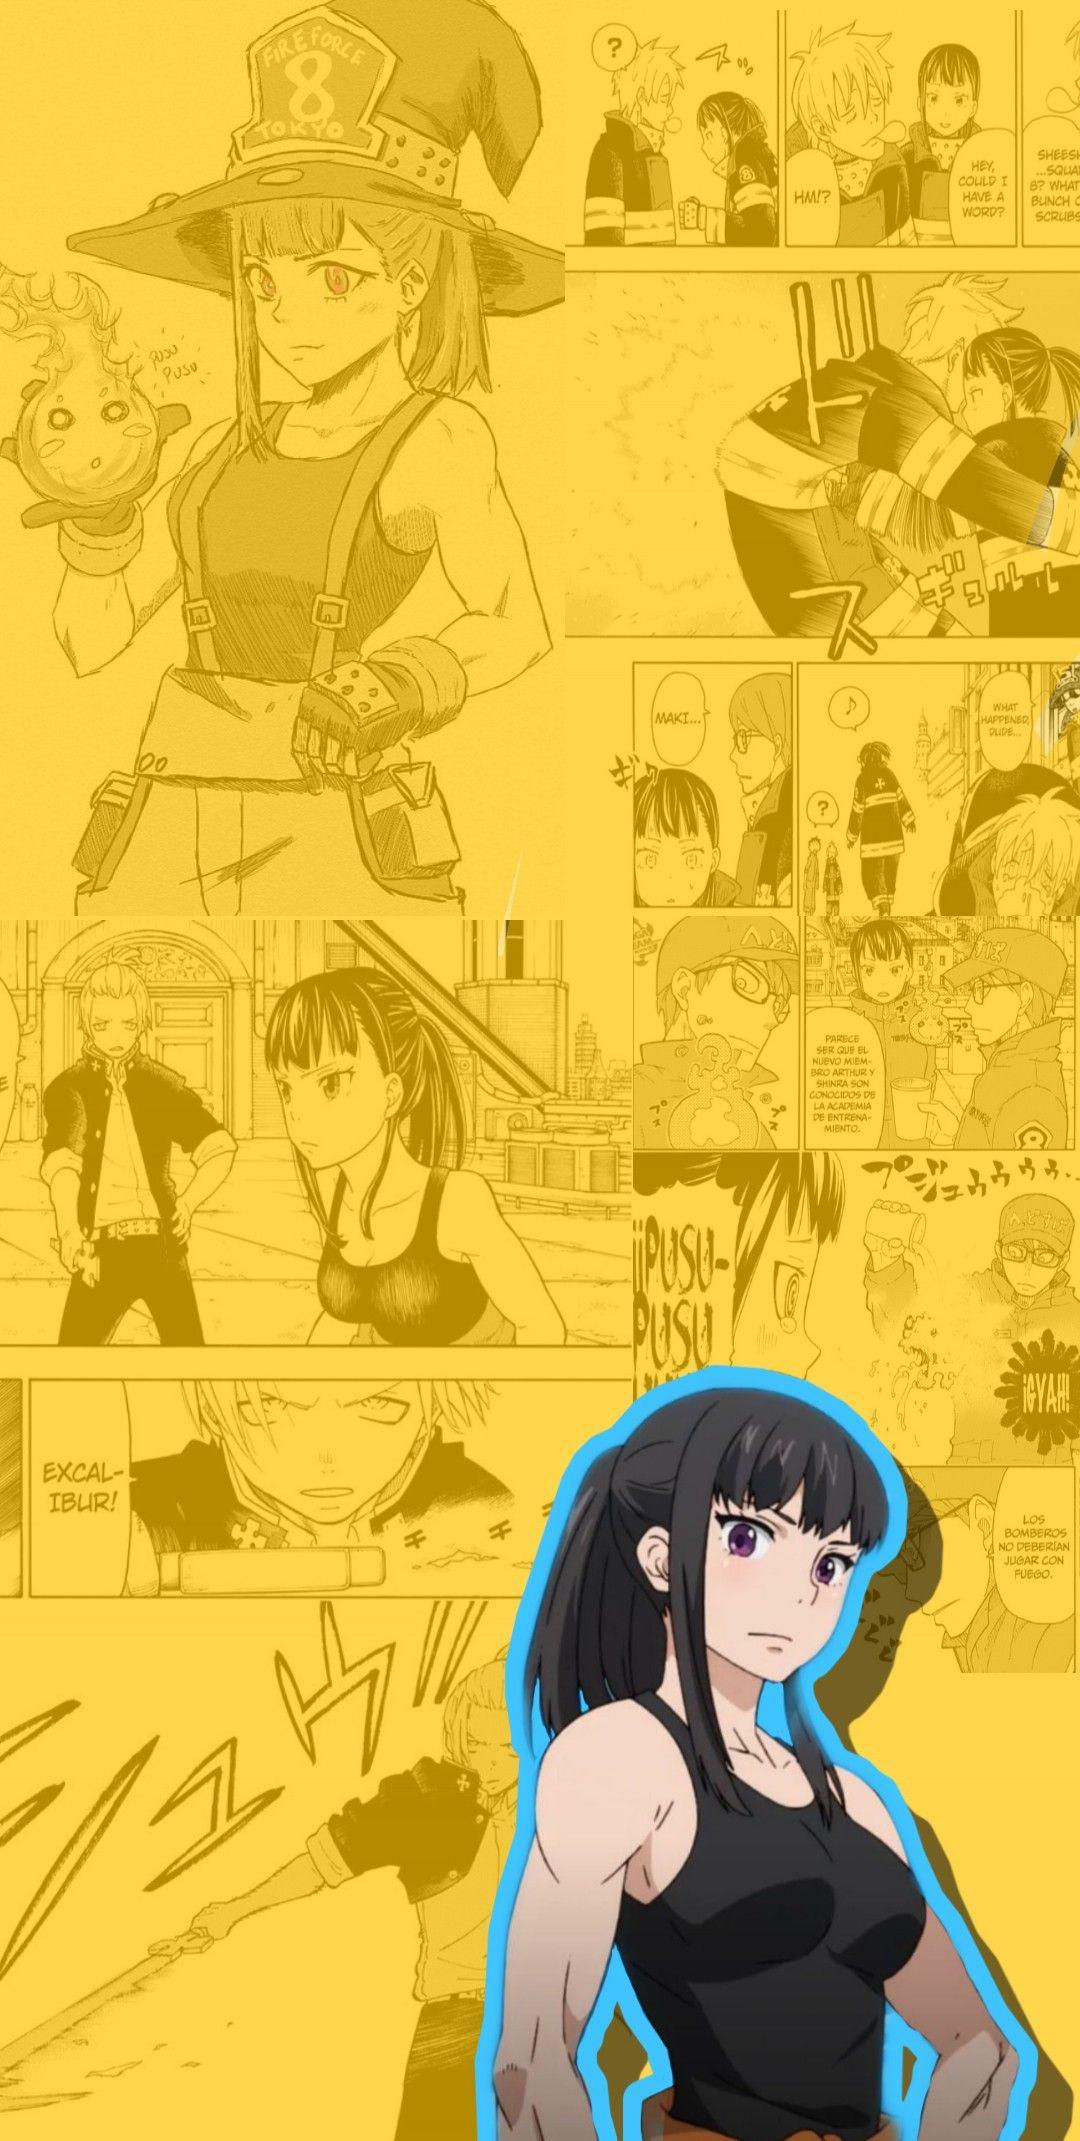 Maki Oze Wallpaper Anime Background Aesthetic Anime Cool Anime Wallpapers